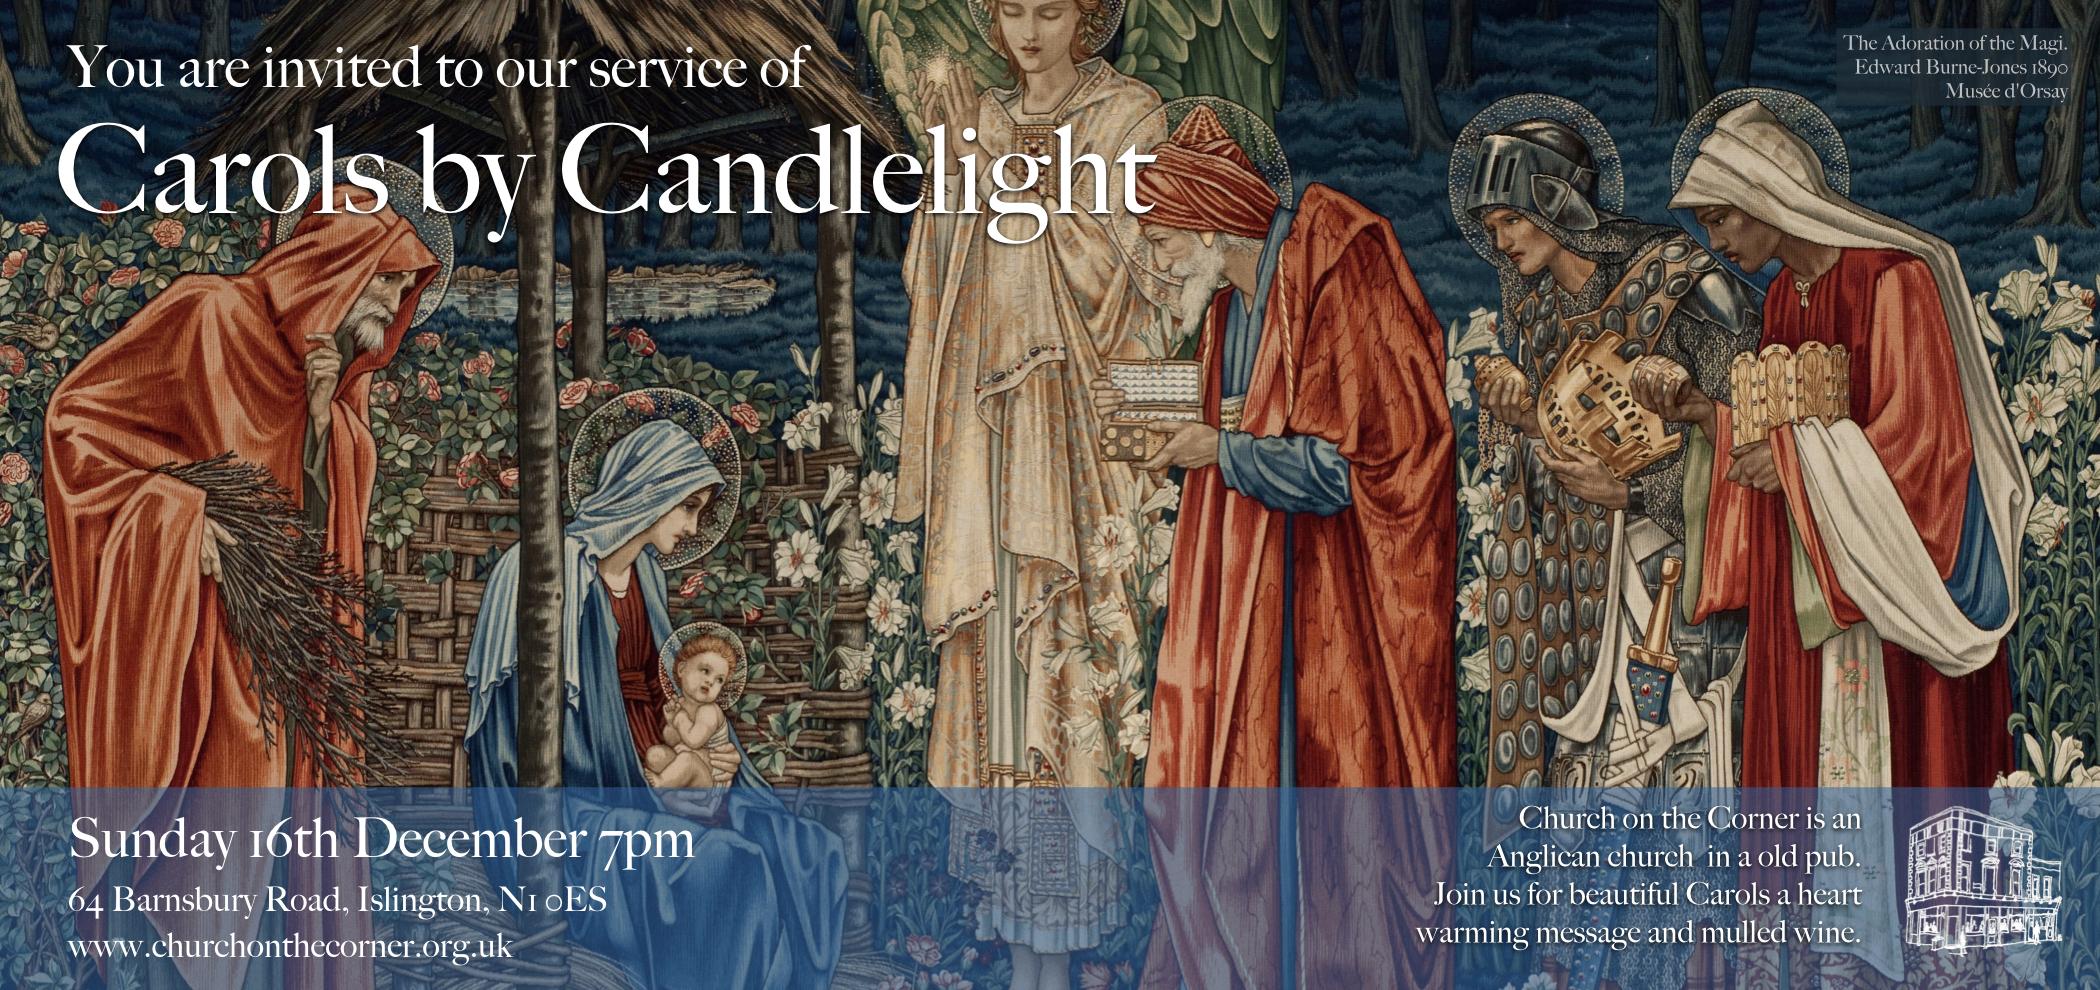 Carol Service Invitation 2018.001